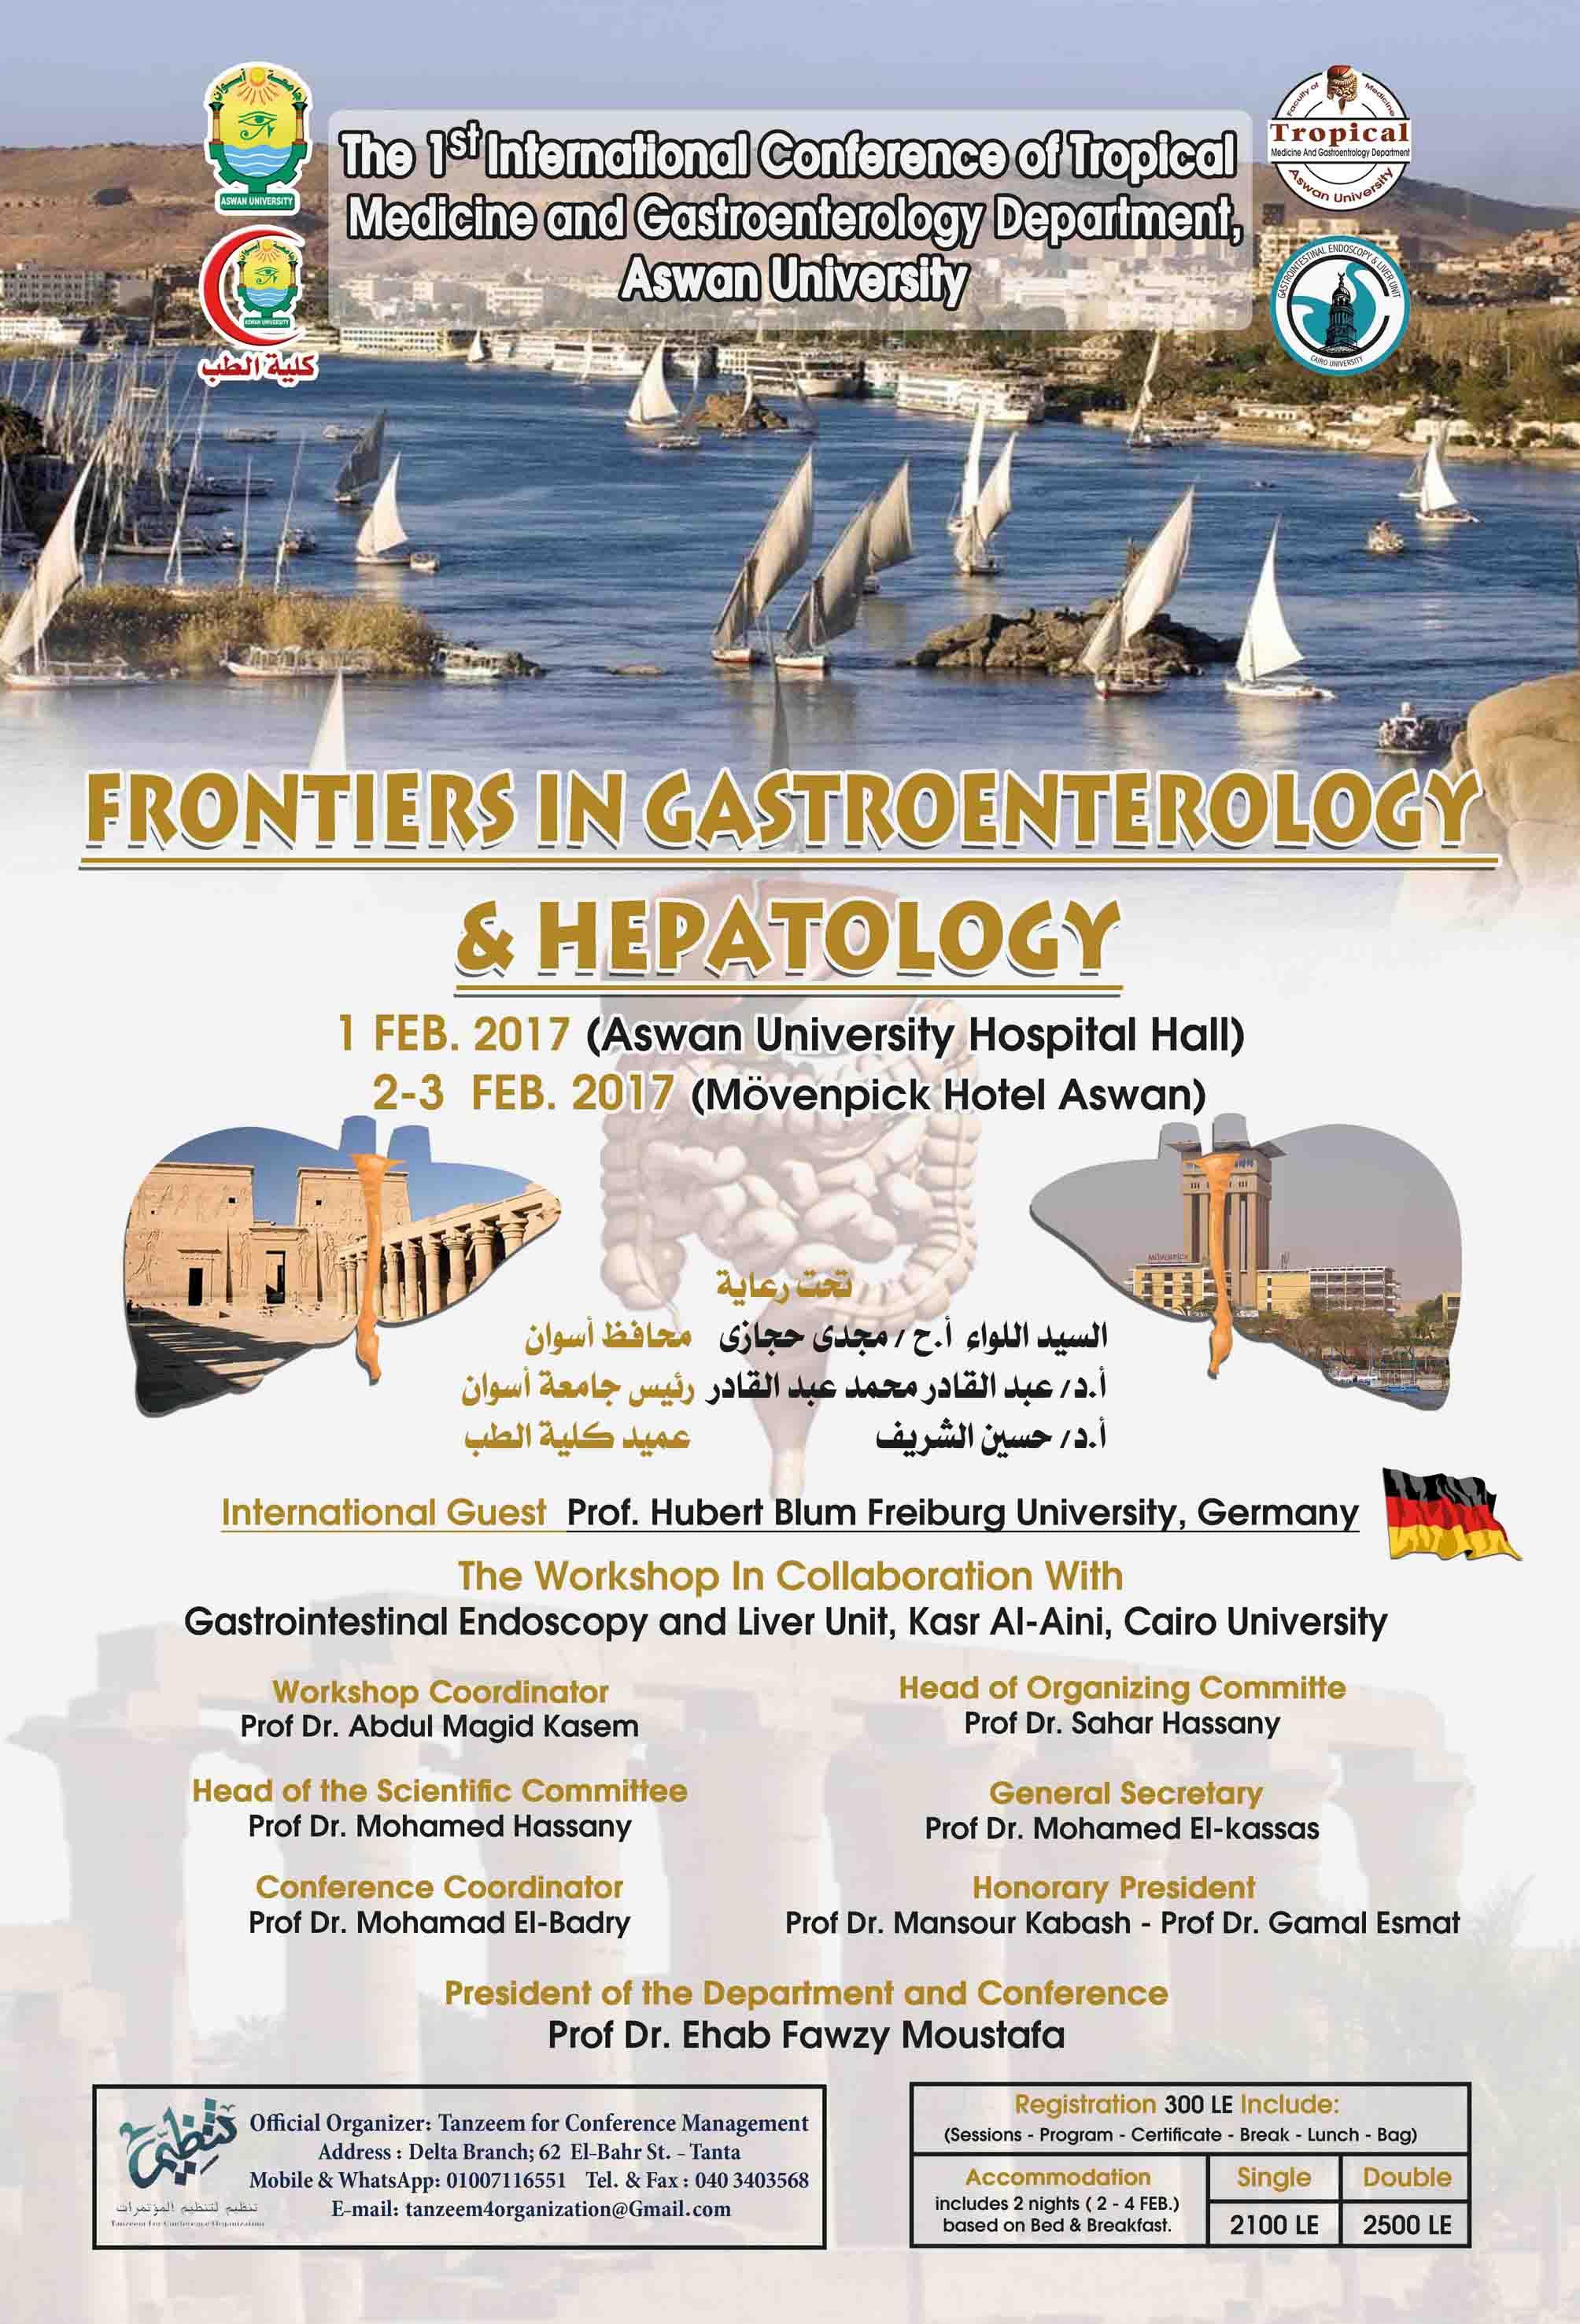 Frontiers in Gastroenterology & Hepatology